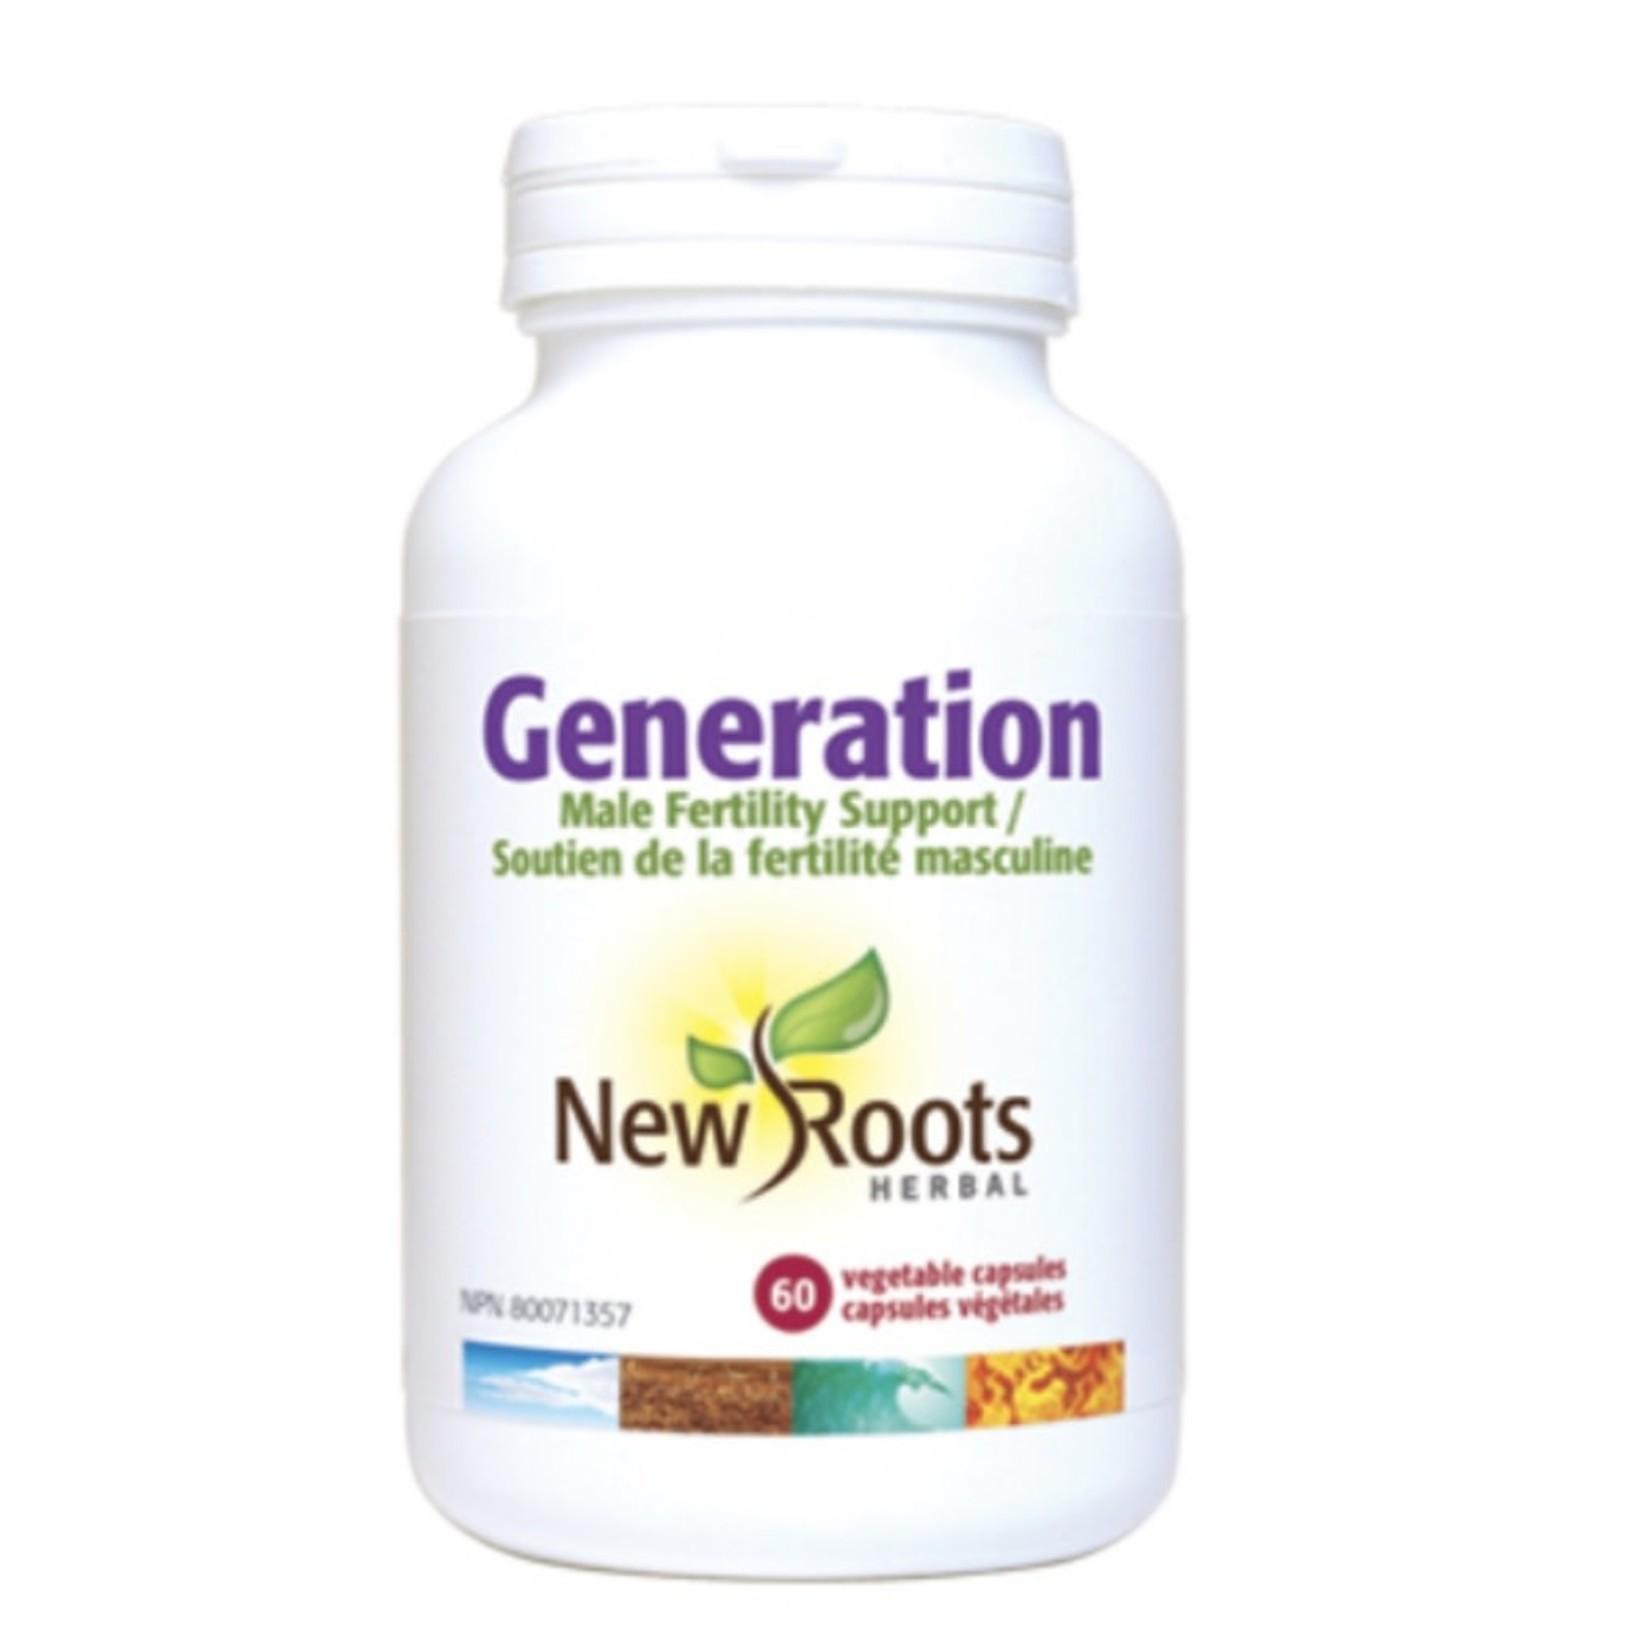 New Roots New Roots Generation 60 caps